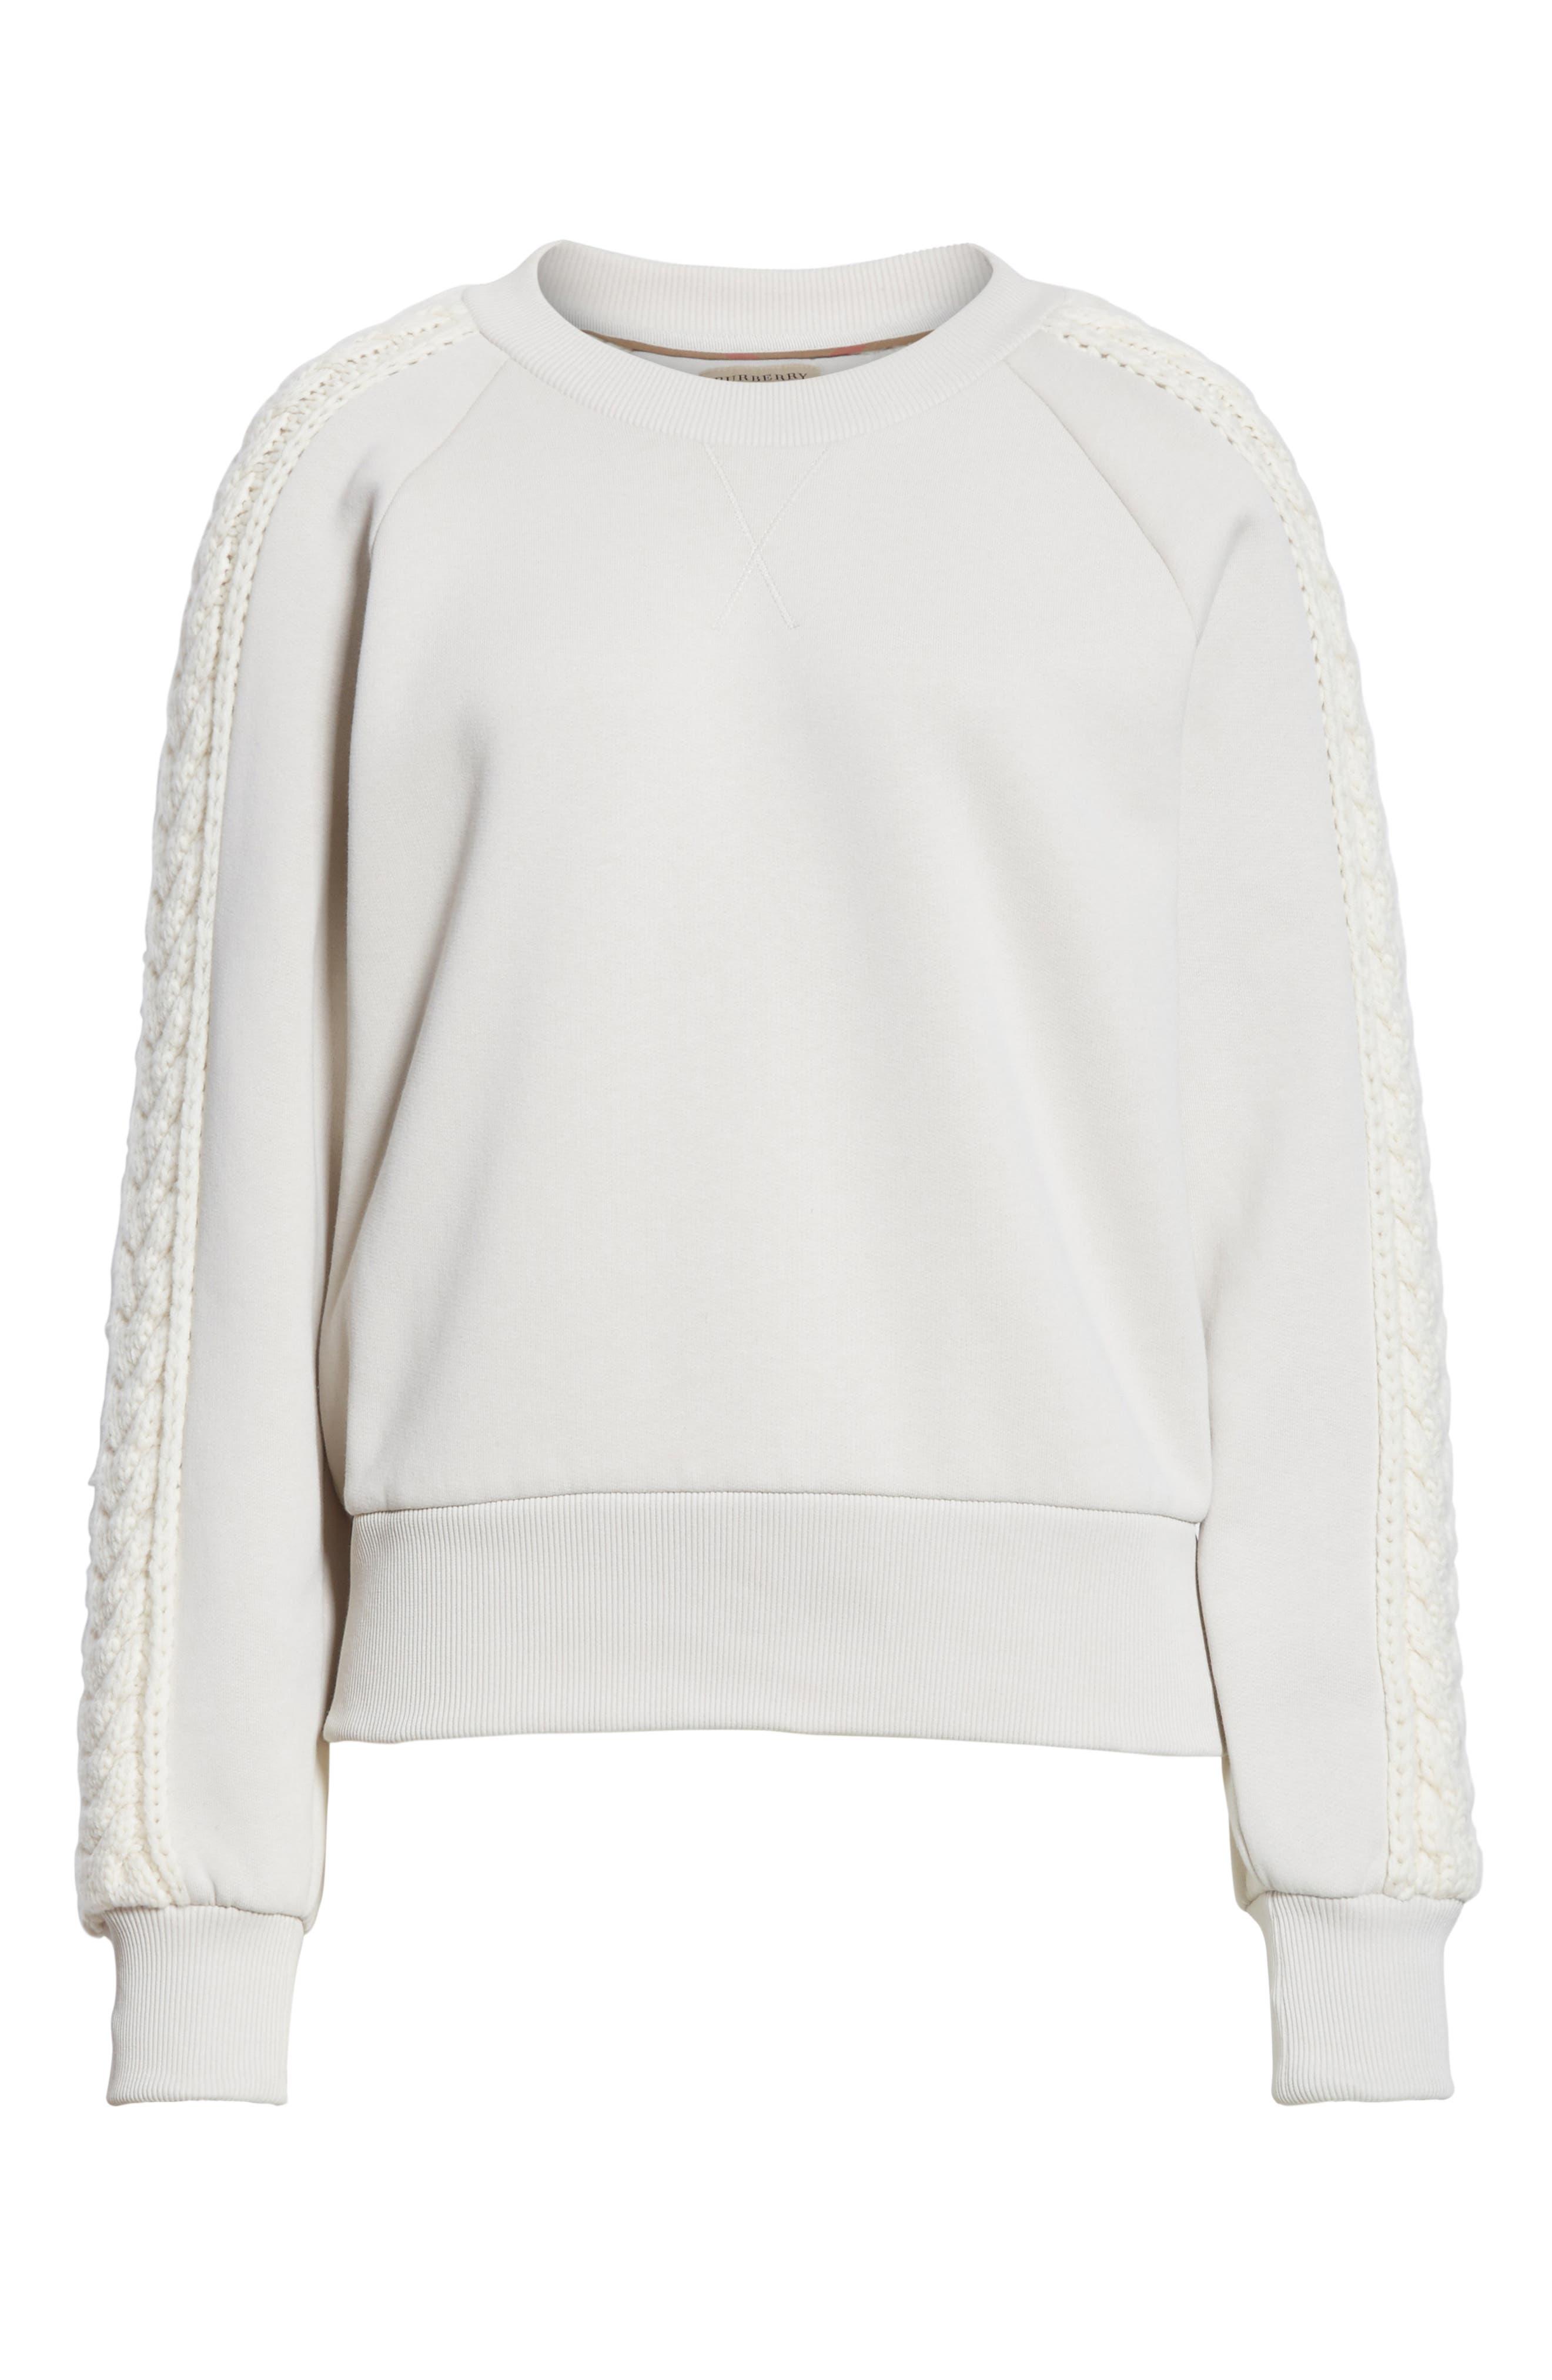 Selho Sweatshirt,                             Alternate thumbnail 6, color,                             Winter White